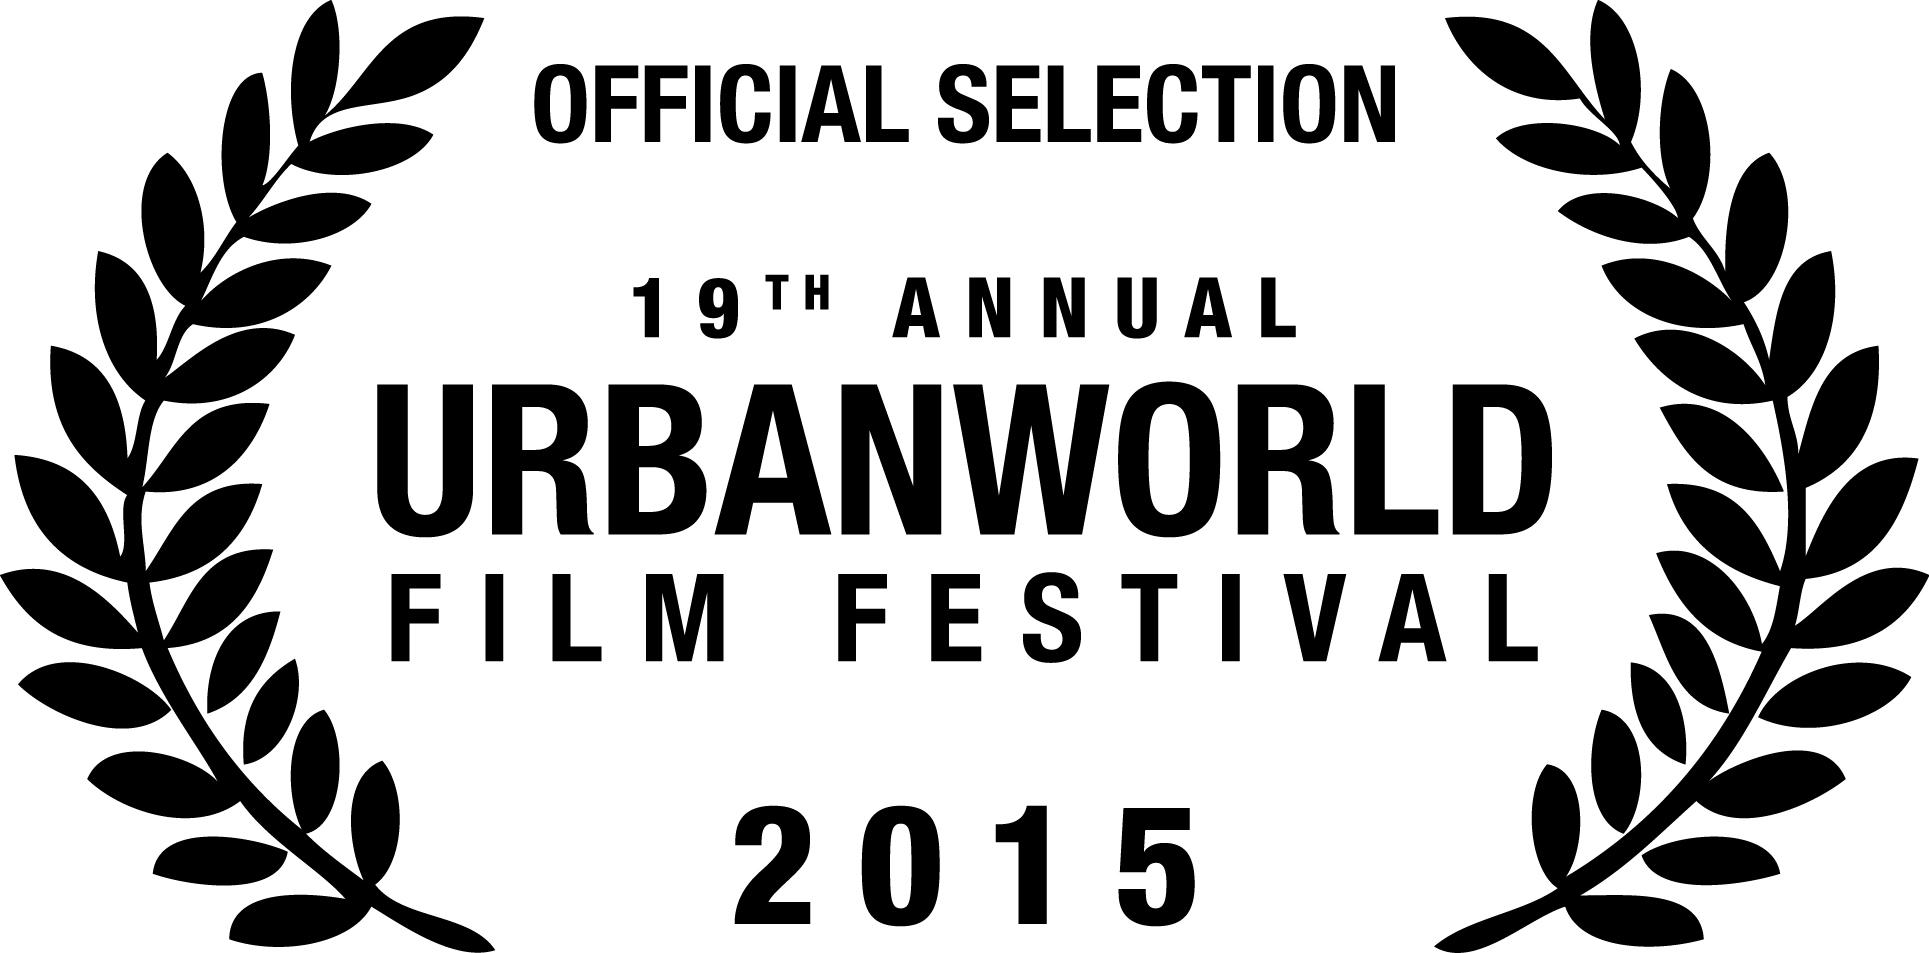 UW15 FestivalLaurels_Selection_OnWhite copy.jpg